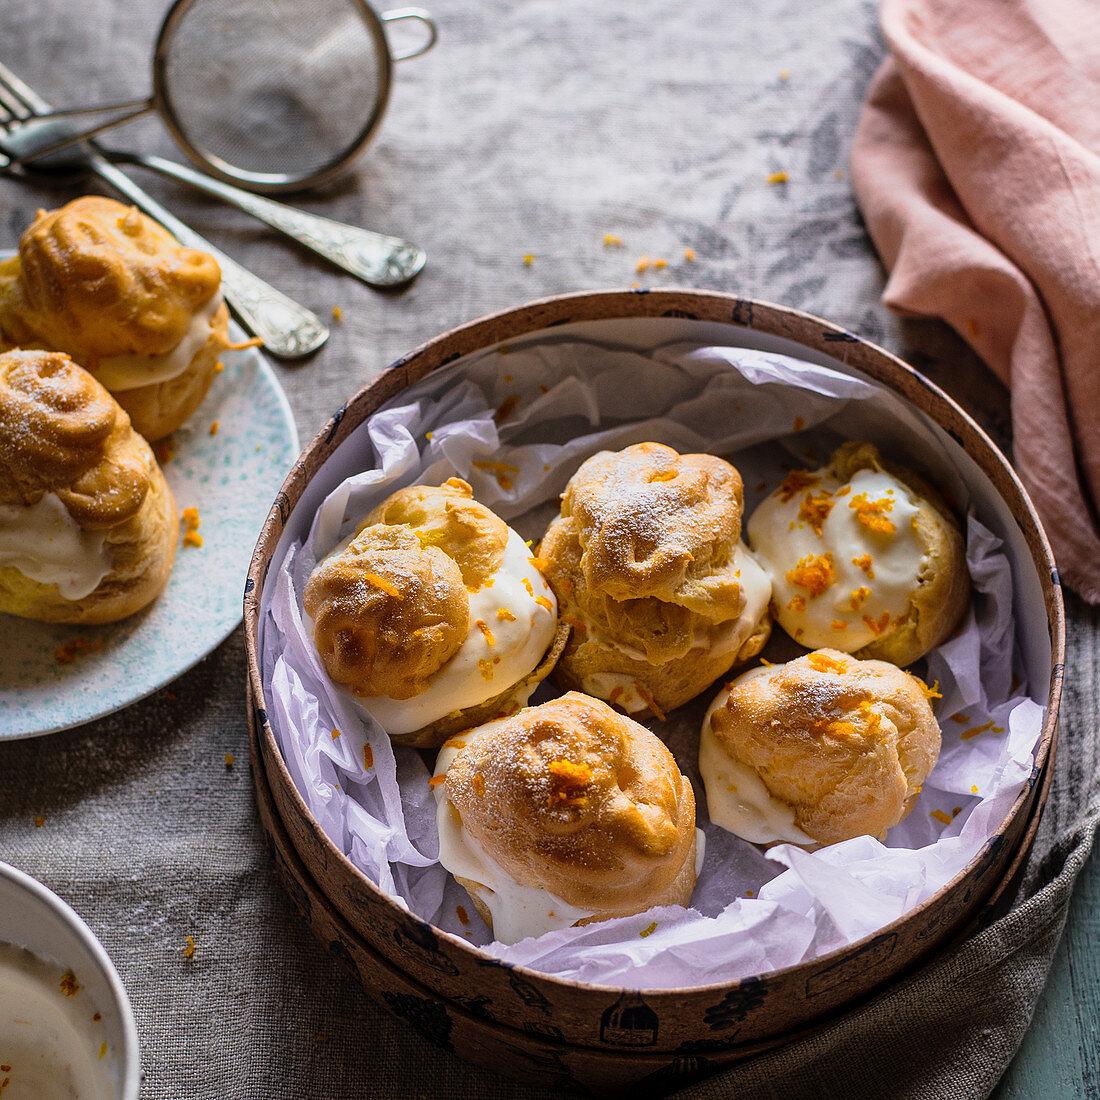 Cream puffs choux à la crème with orange custard and Italian meringue